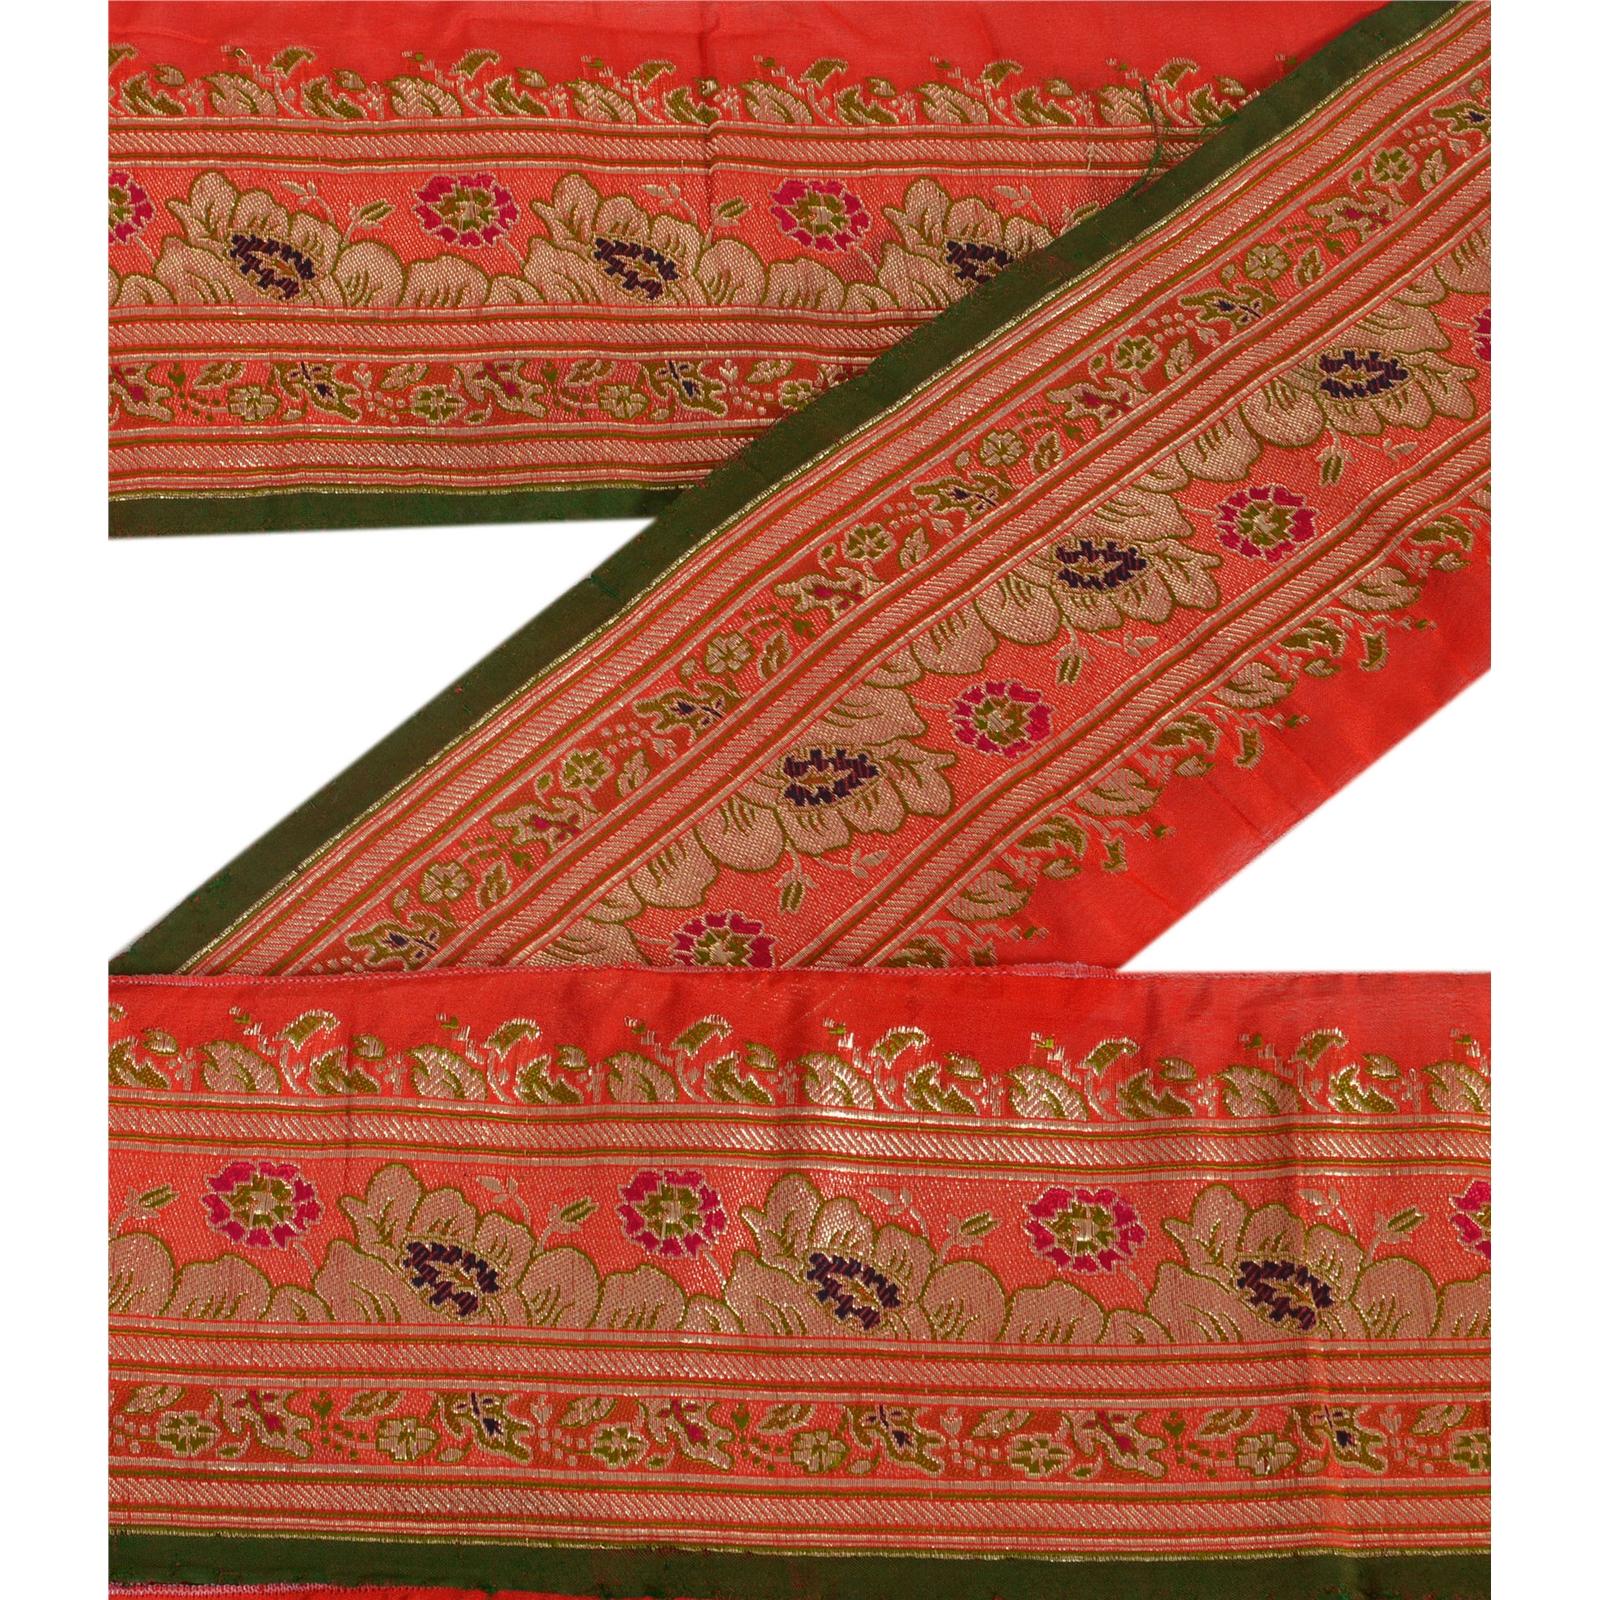 Sanskriti Vintage Sari Border Indian Craft Orange Trim Hand Beaded Ribbon Lace Trims